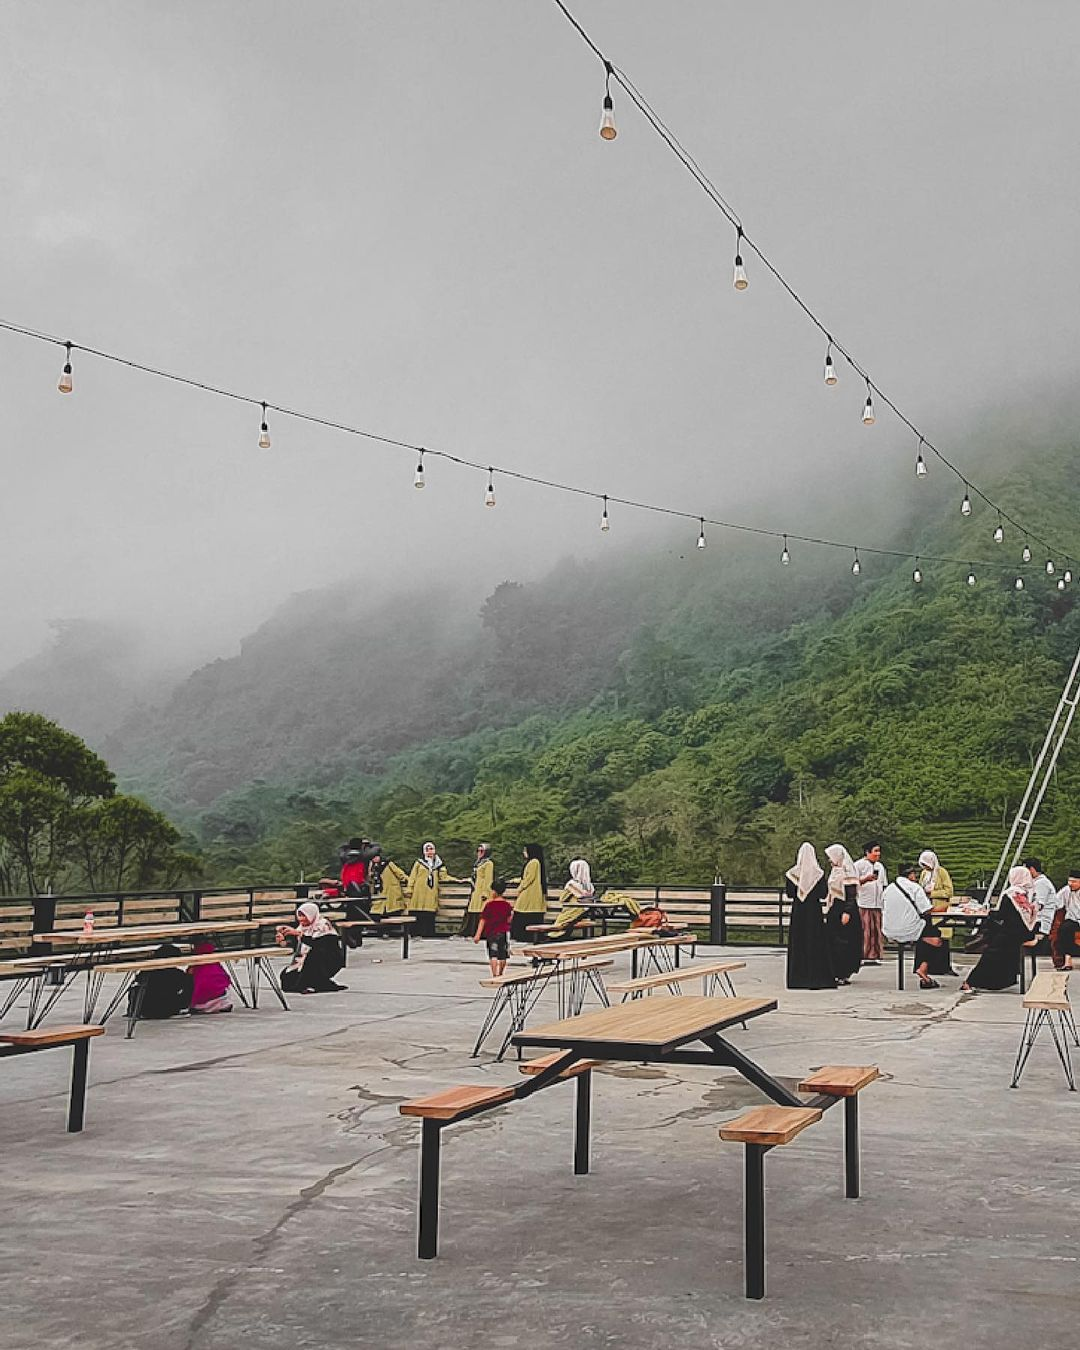 Suasana Pengunjung Di Aworjiwa Coffee Bromo Image From @kuliner_jember